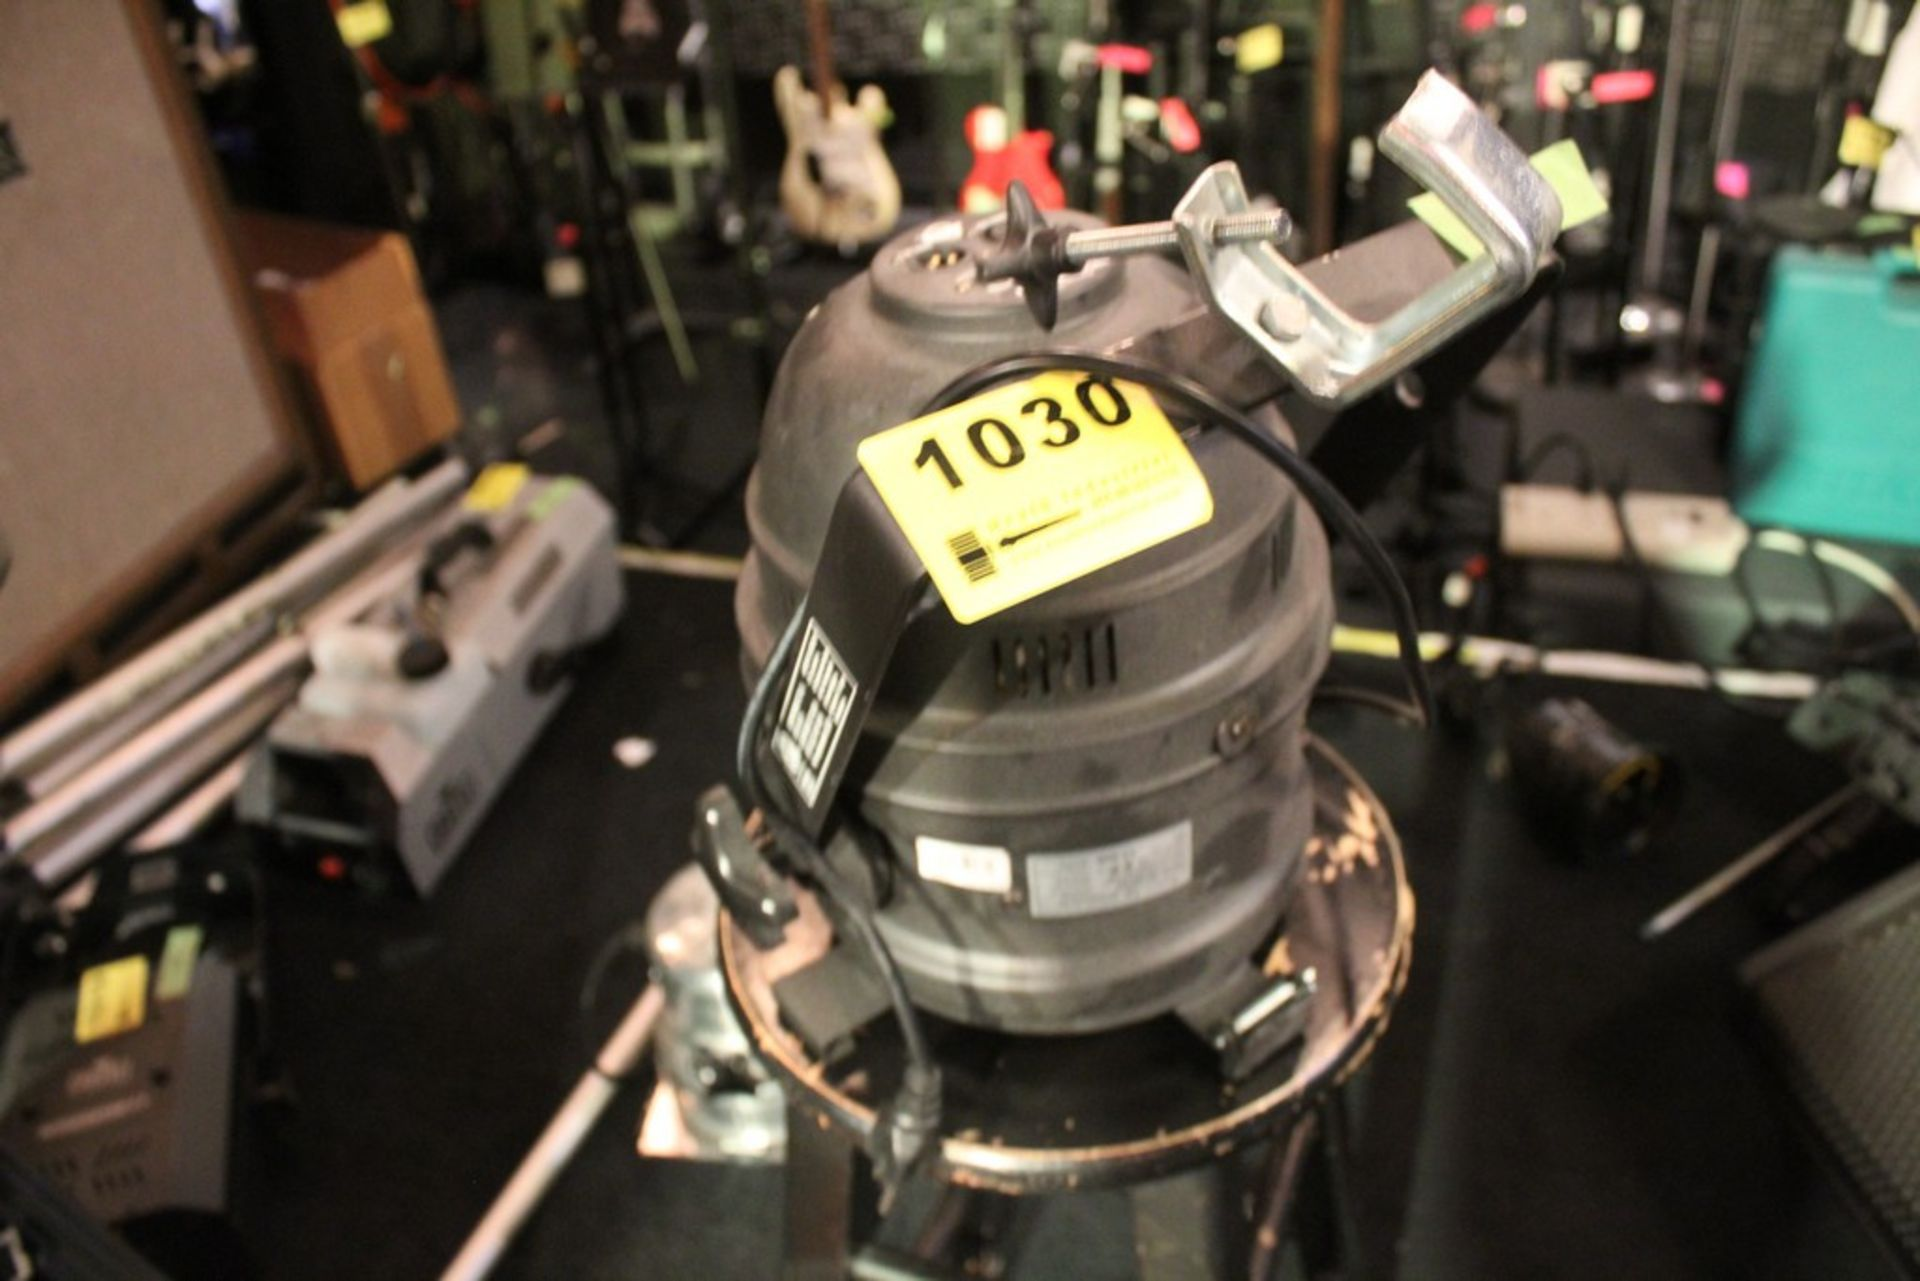 Lot 1030 - AMERICAN MODEL DJ P64 PROFESSIONAL CAN DMX LED LIGHT